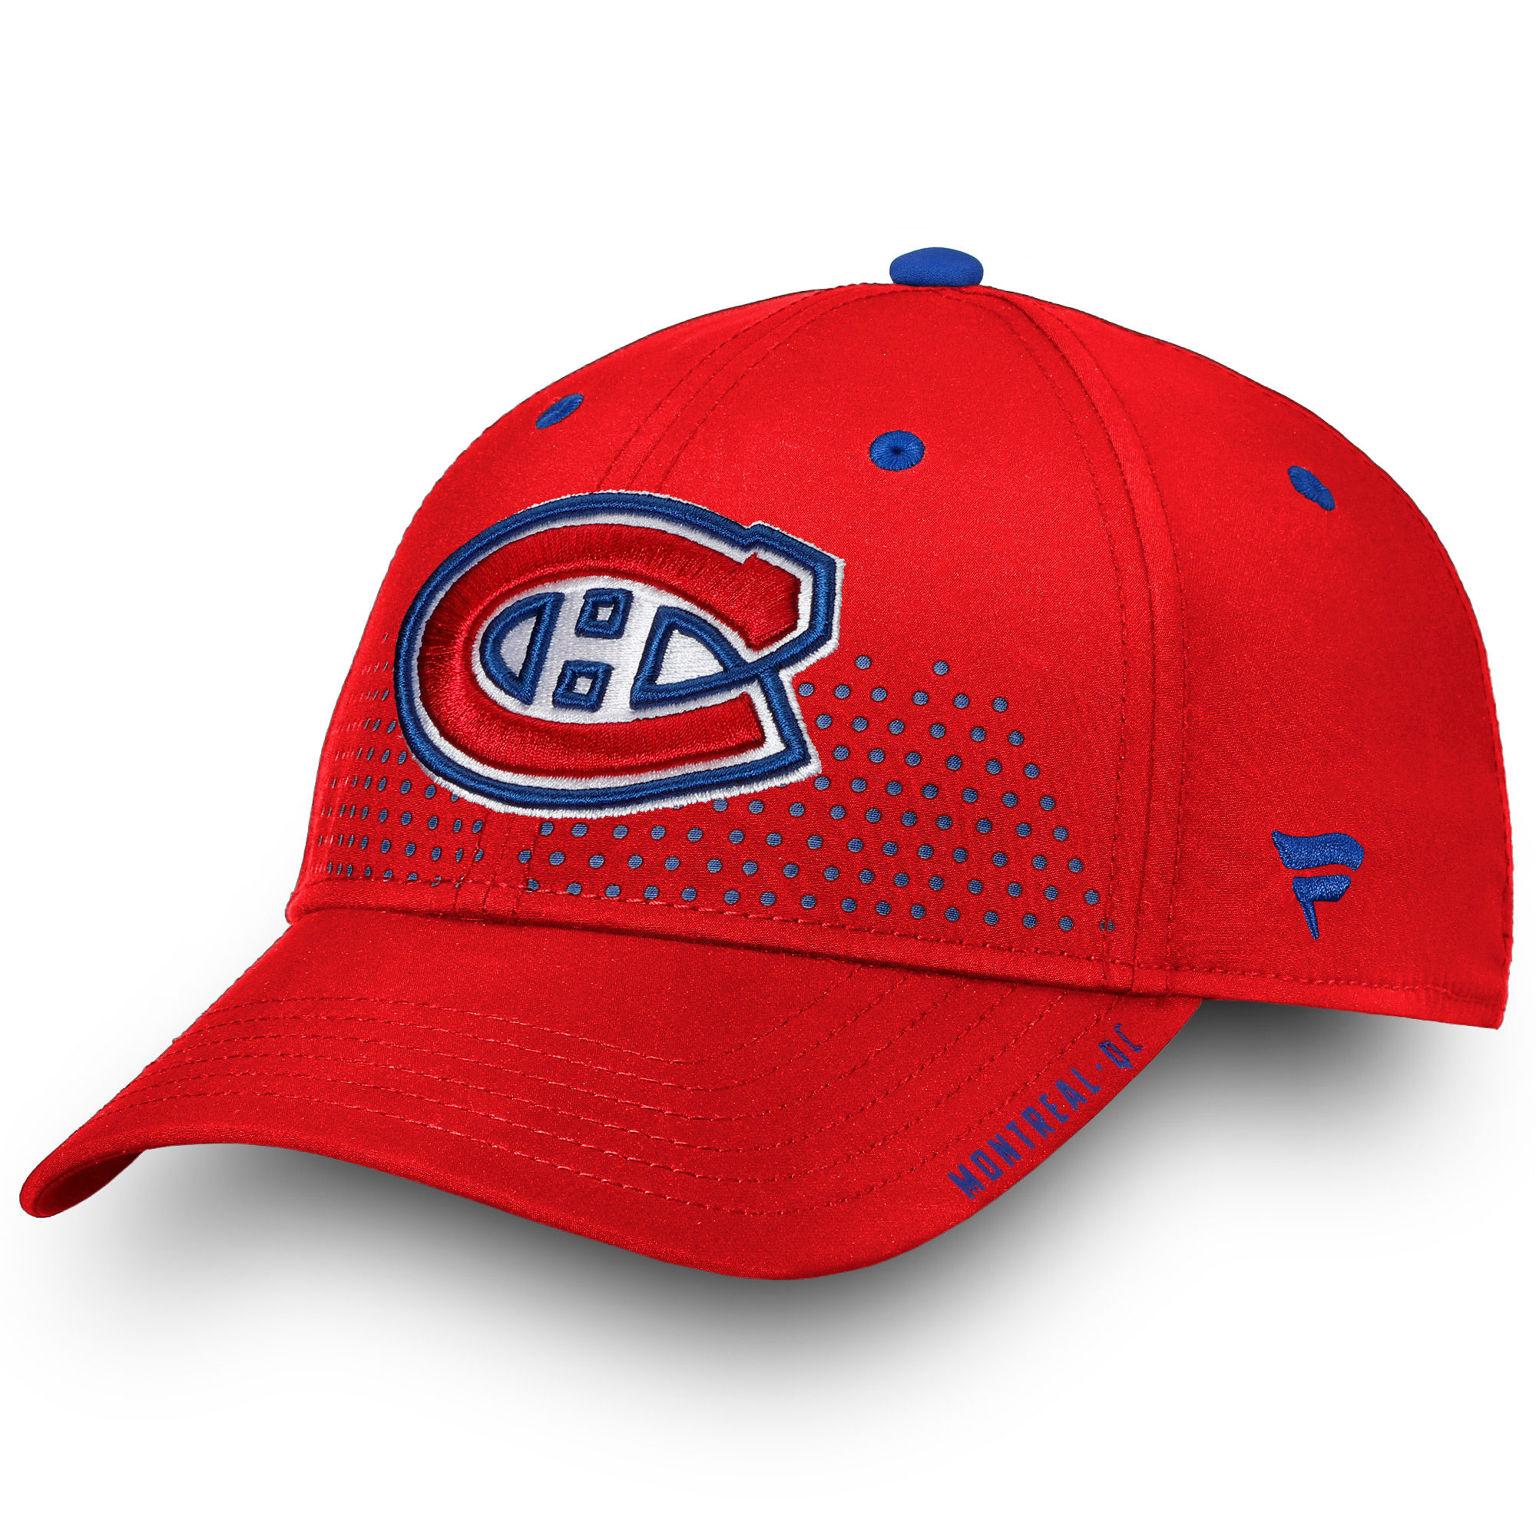 469f29d8957 Reebok Montreal Canadiens - Winter Hat